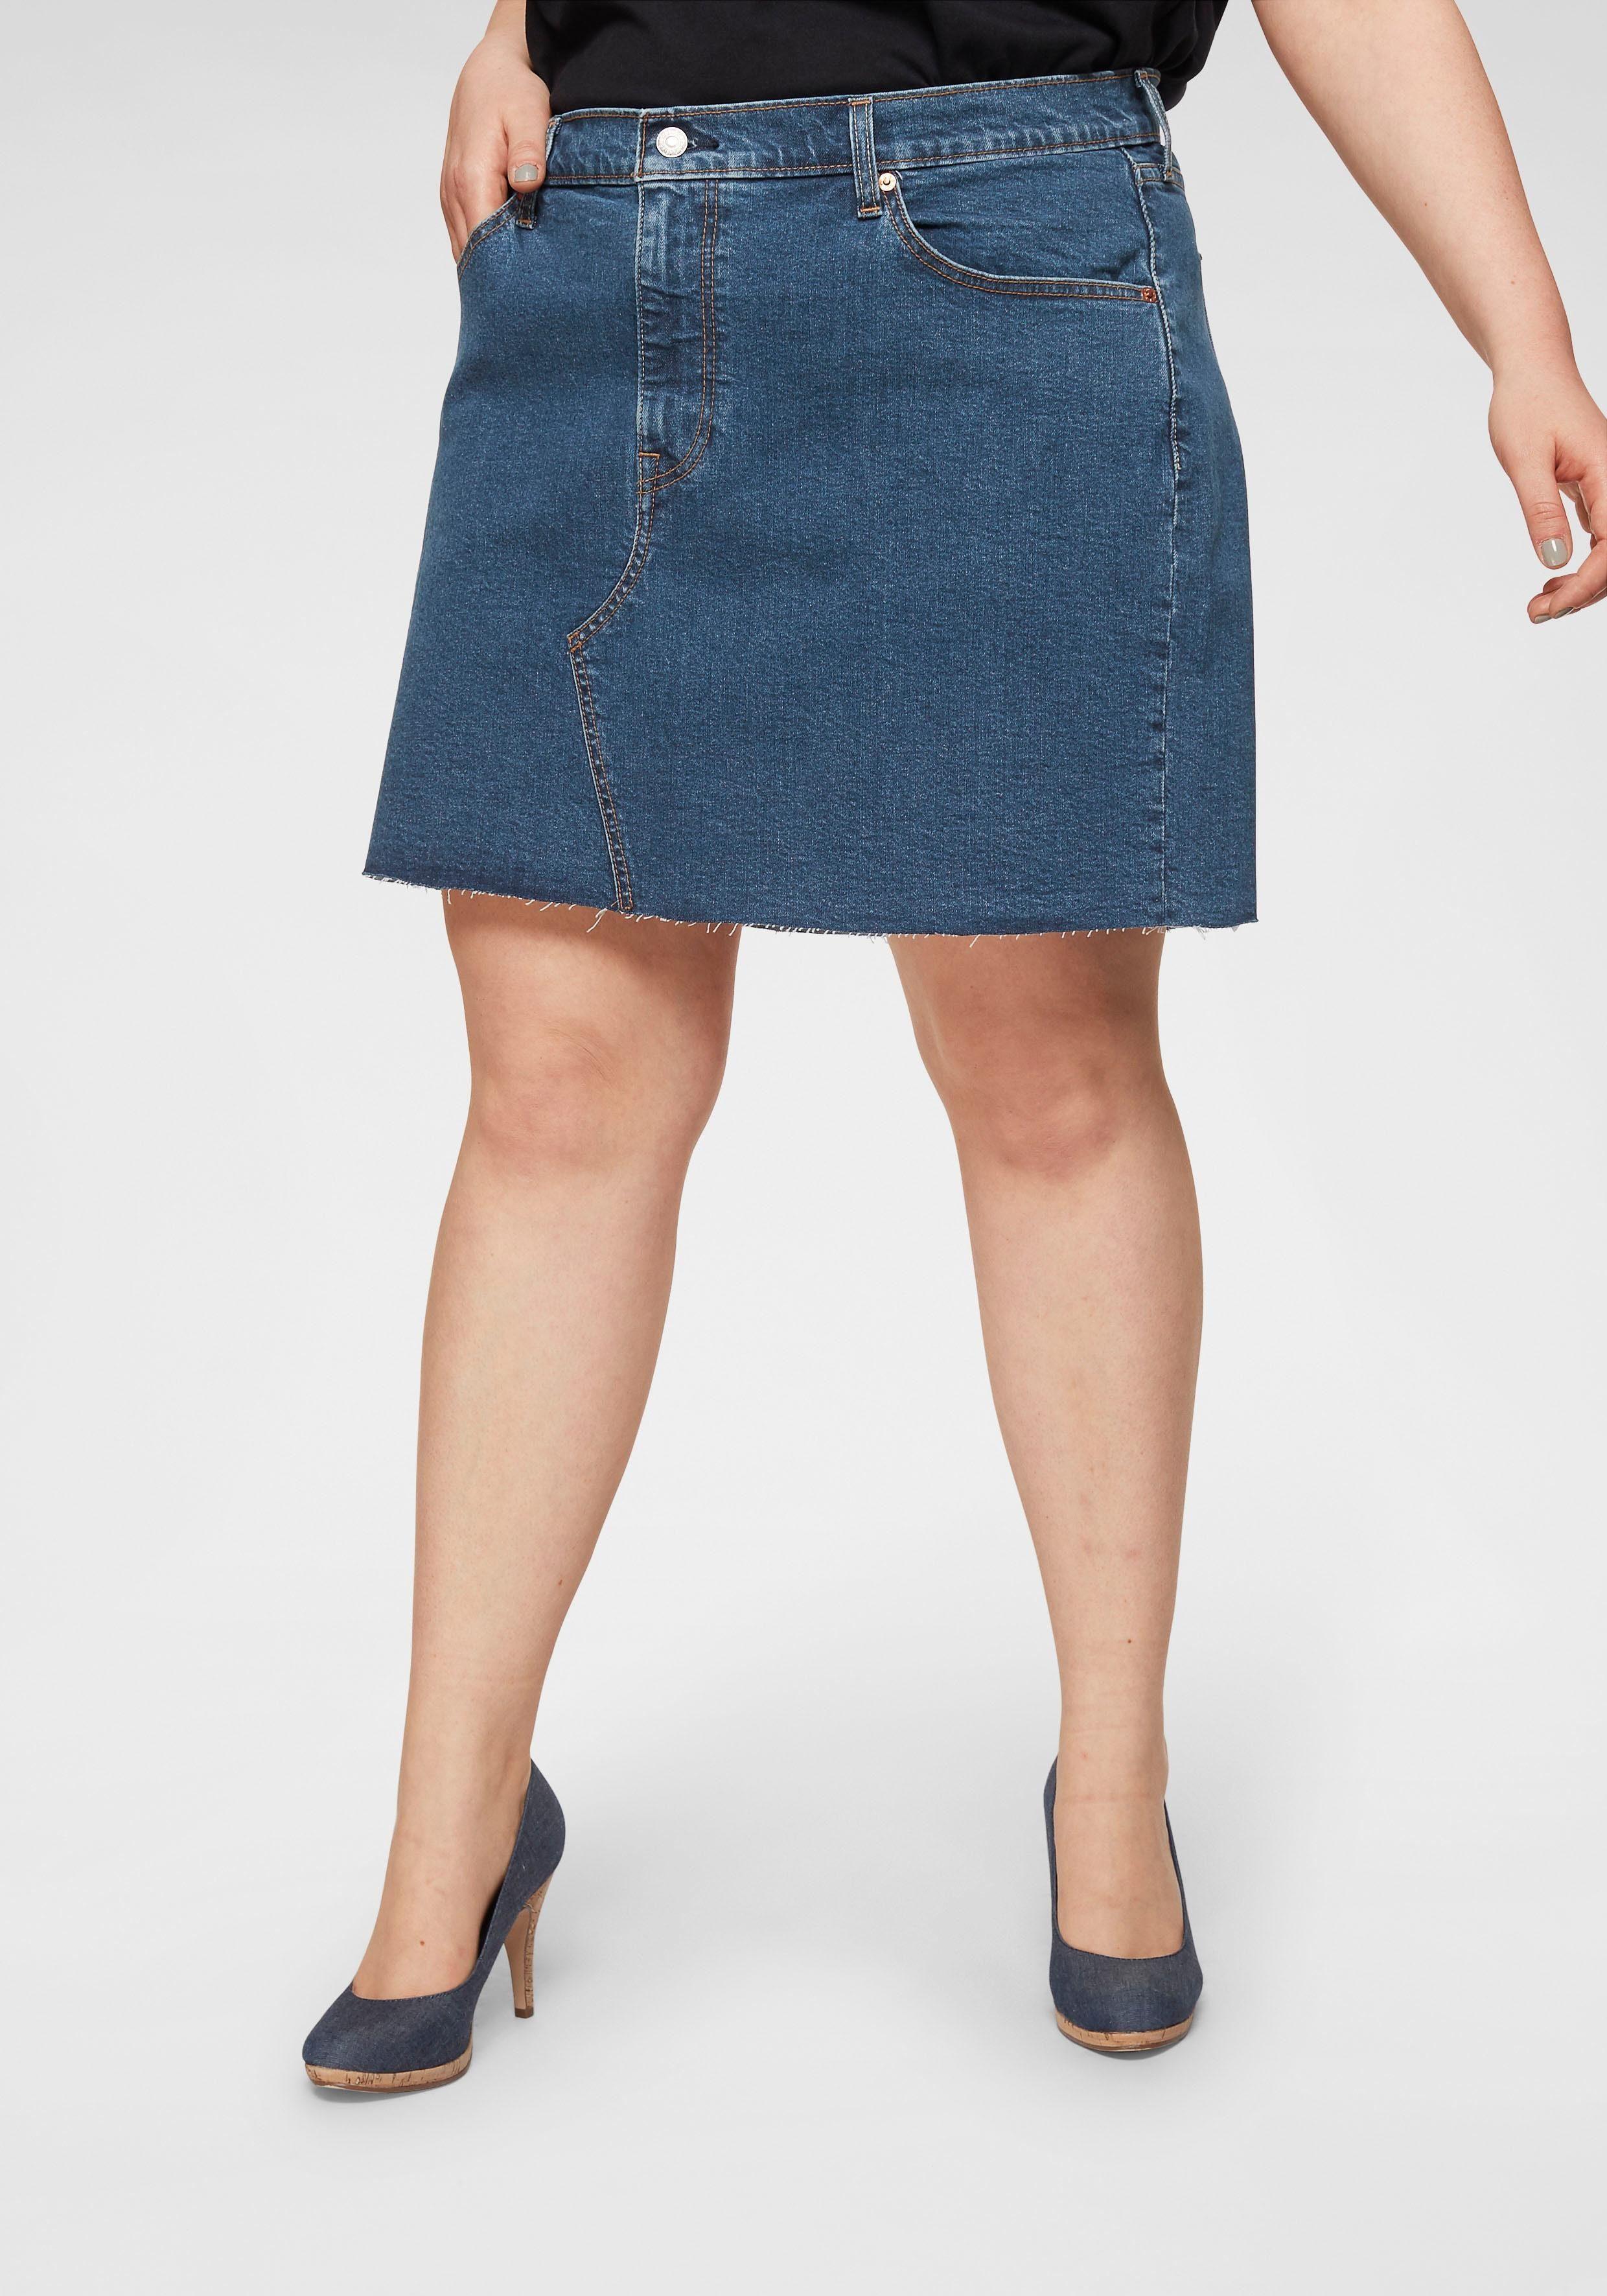 Jeansrock kurz Used-Waschung Kurzer-Rock Minirock Große Größen Blau Aniston SALE